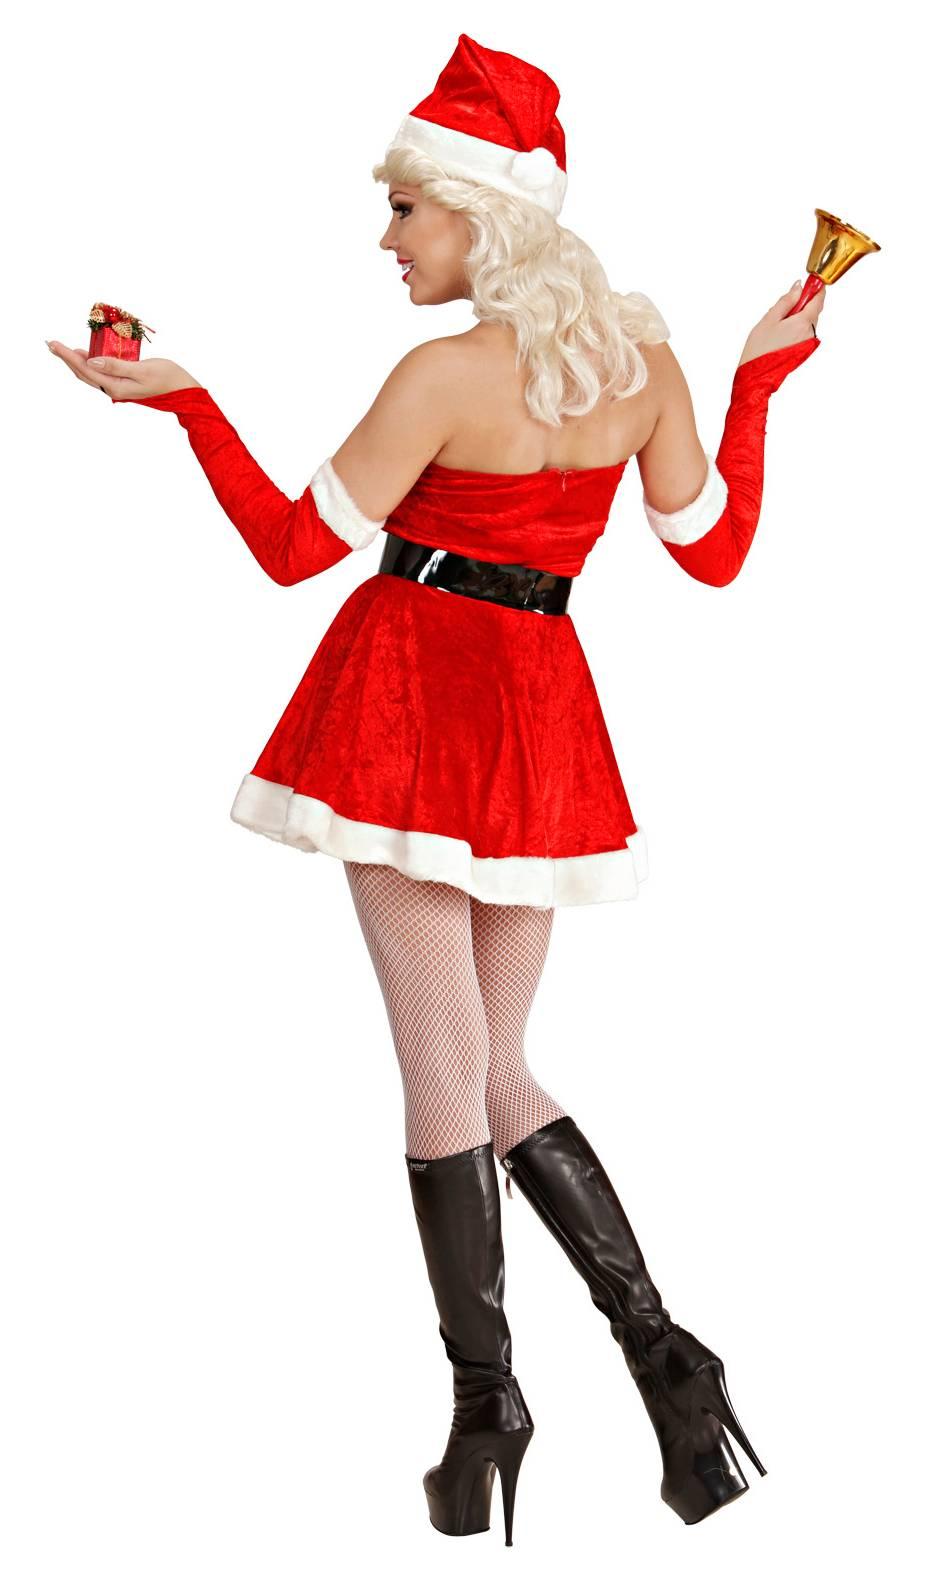 Costume-Mère-Noël-Grande-Taille-XL-2